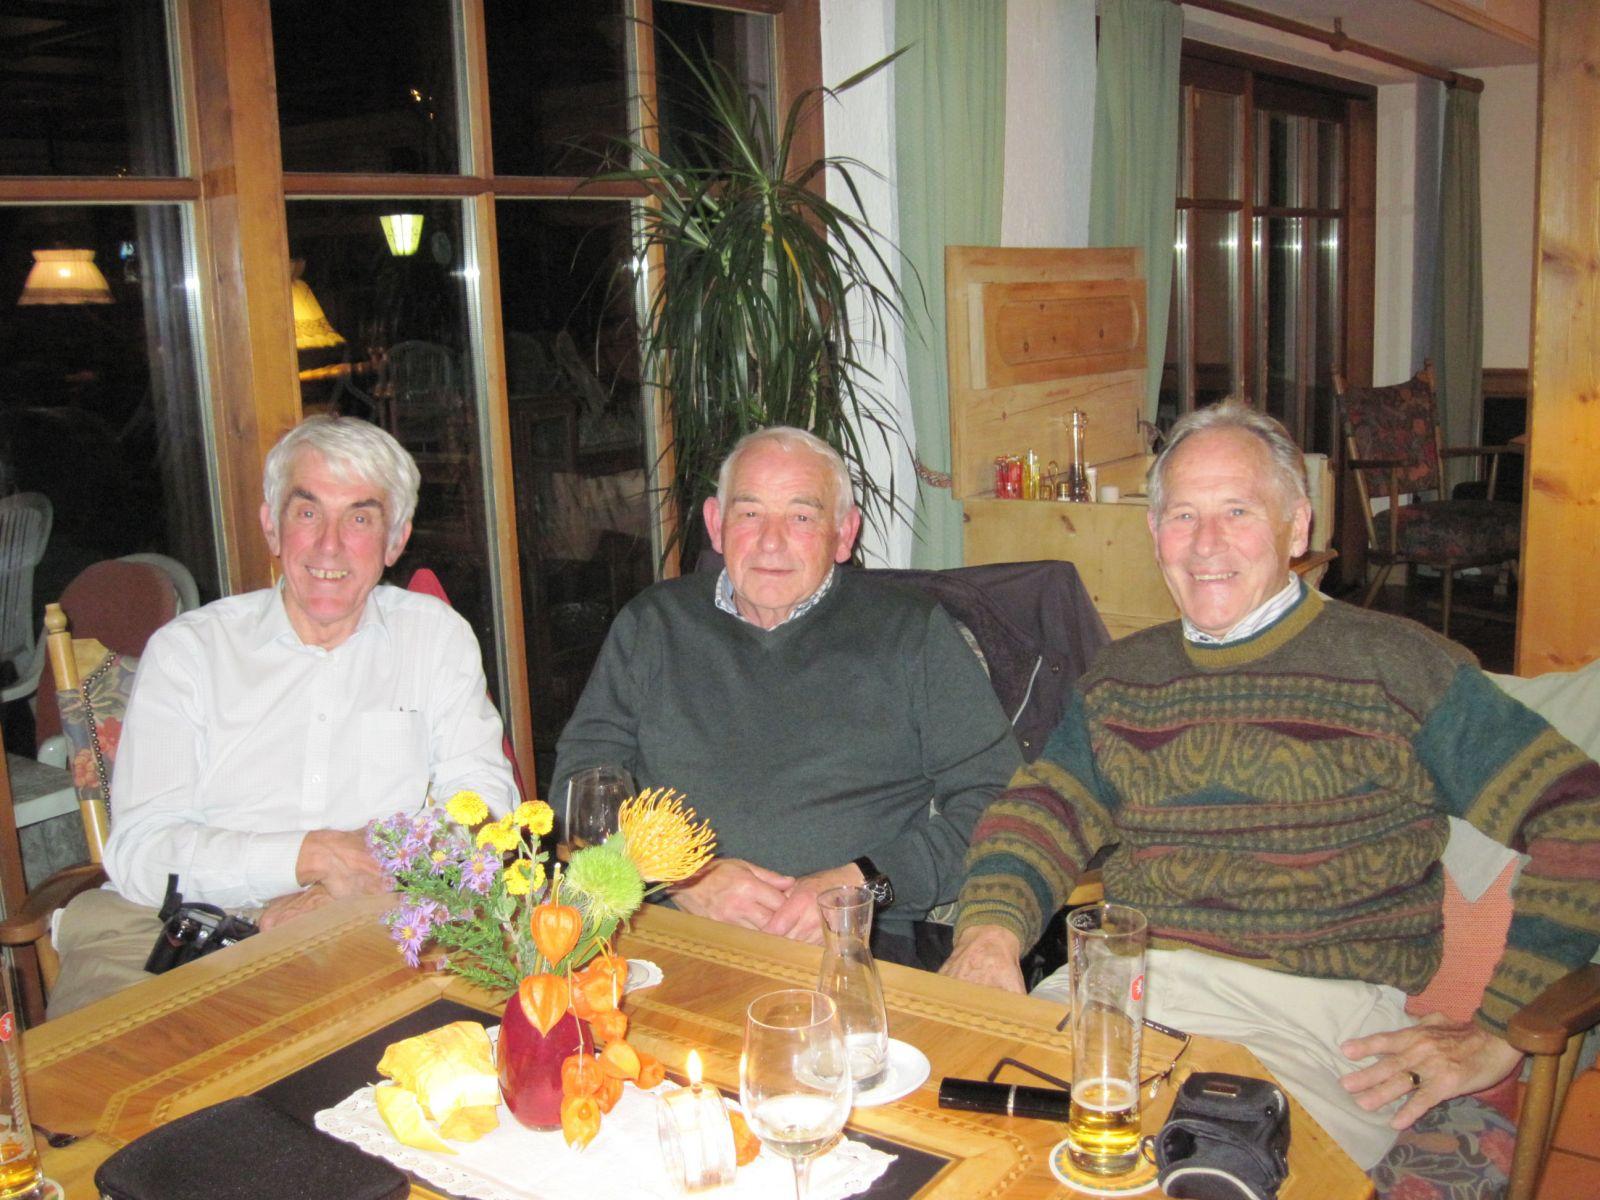 G3TXF (Nigel), OE9NFI ( Egon), OE9WGI (Walt)  Okt. 2013